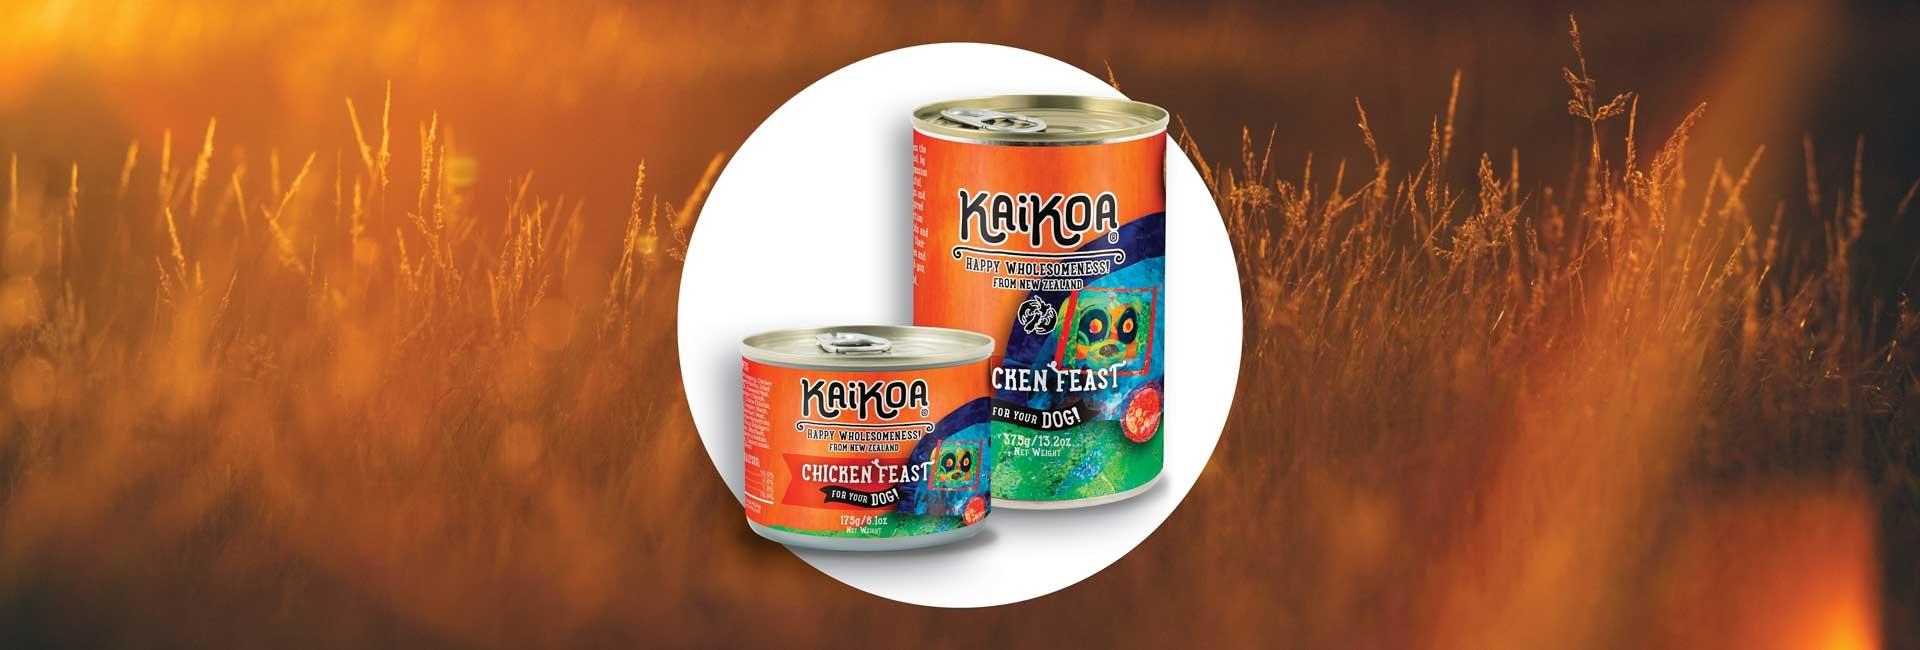 Kaikoa Dog Chicken Feast Grain-Free Wet Dog Food